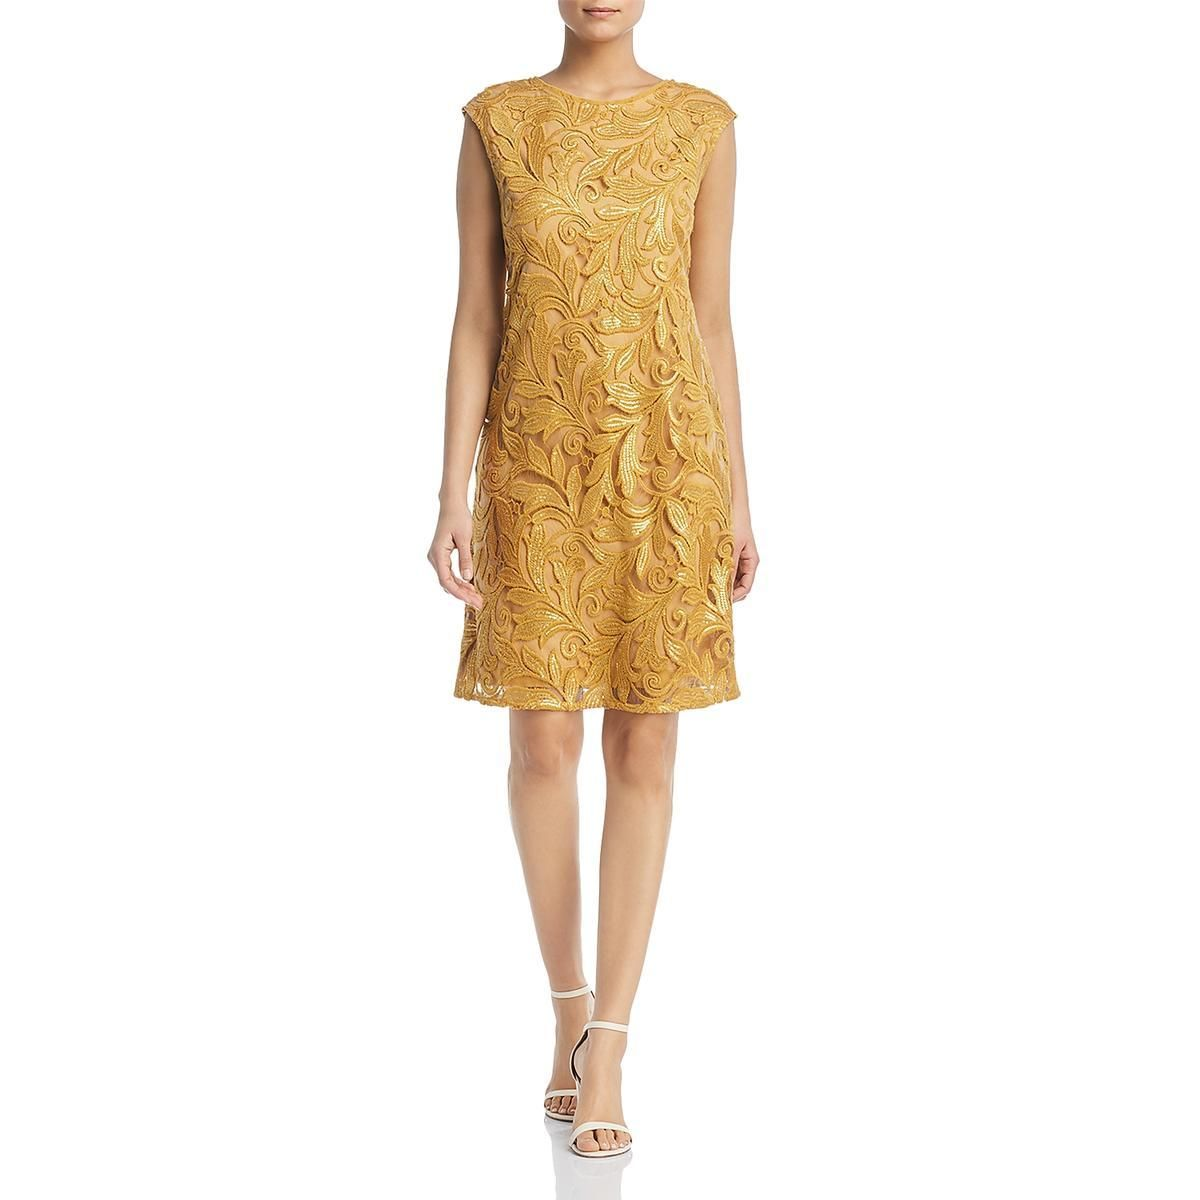 Nic + Zoe Womens Party Gold Size Medium